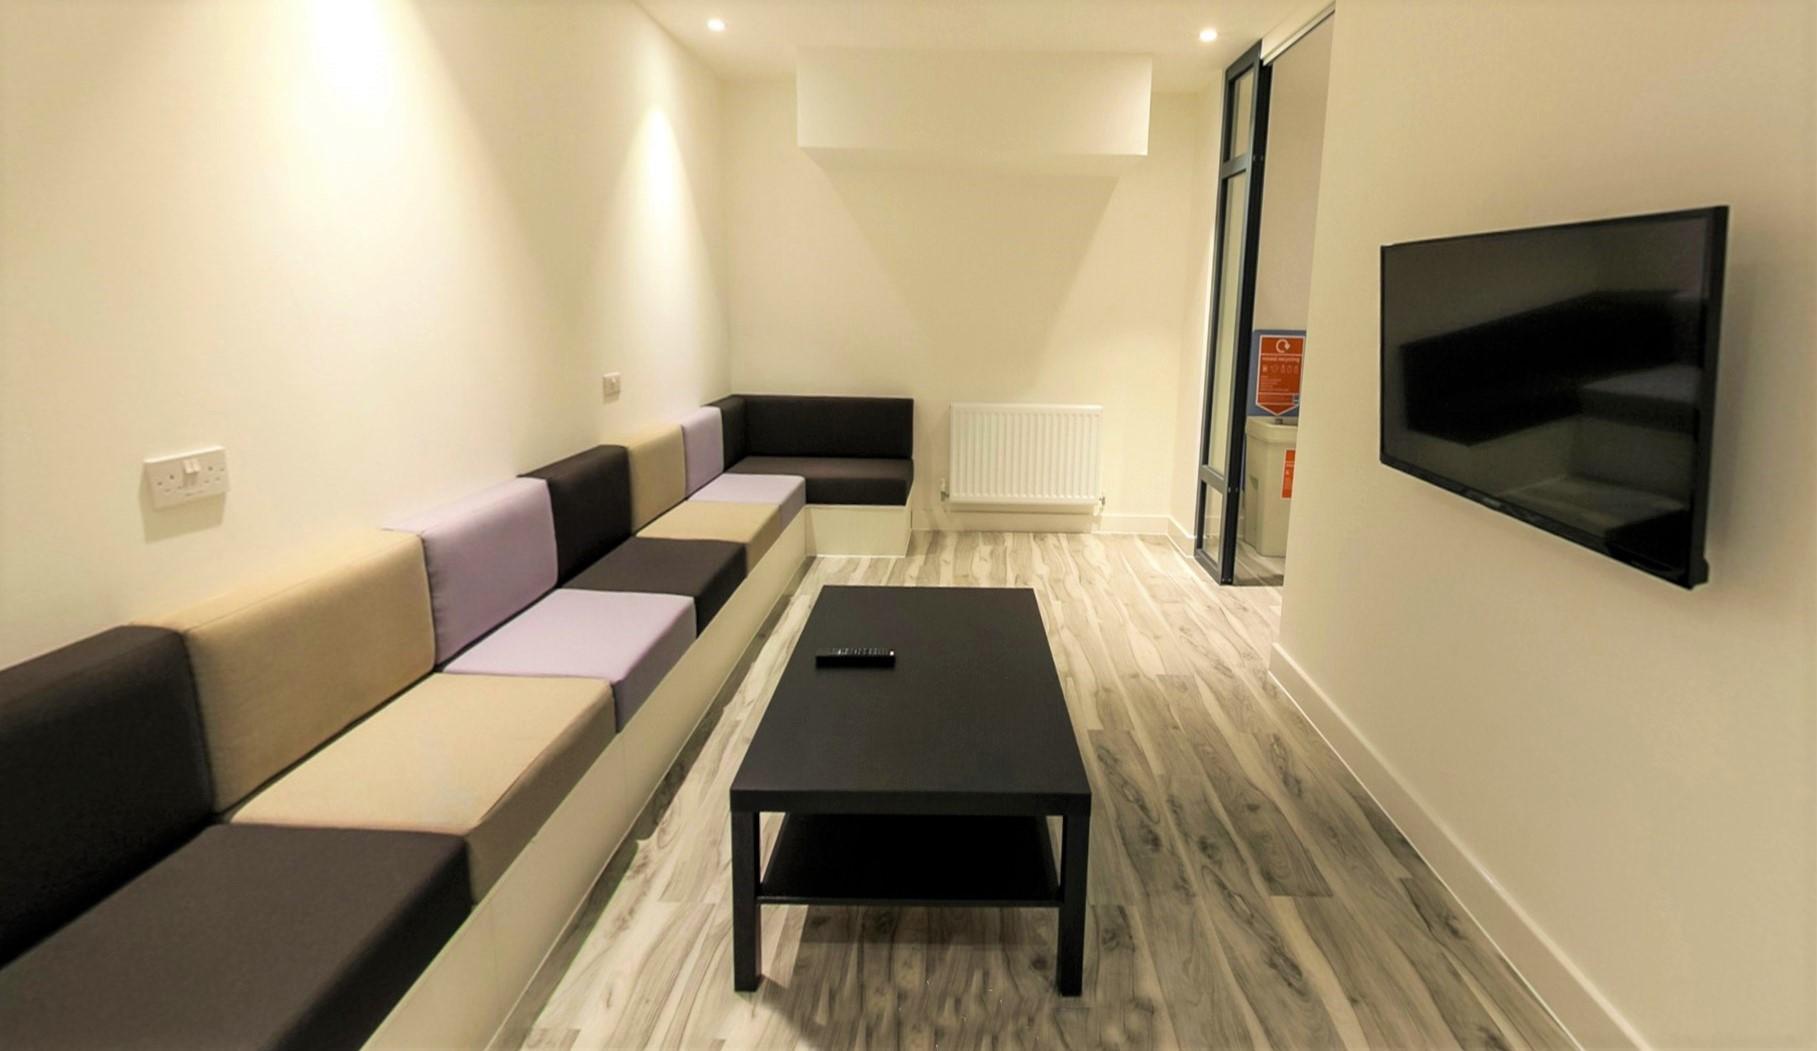 kingston-university-92c1ab9ce70-75penrhynroadcommonroom